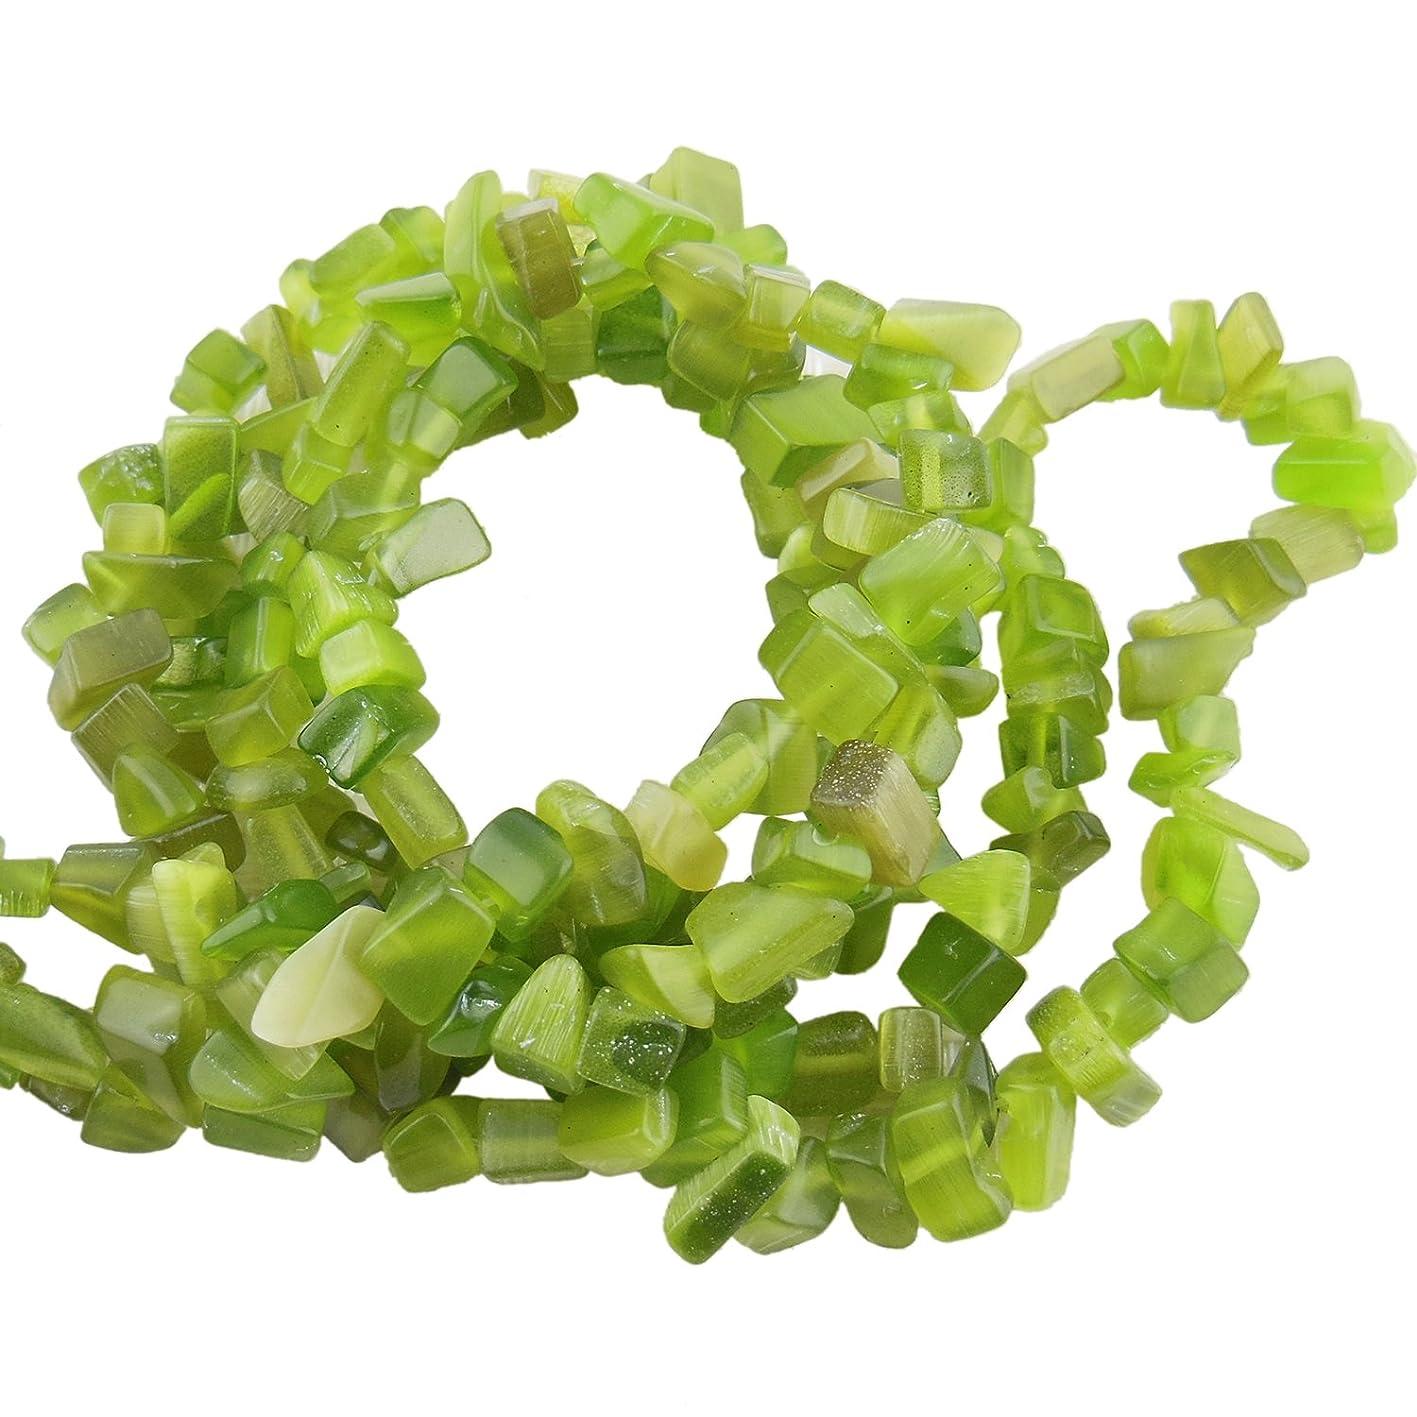 33'' Strand 5-8MM Natural Cat Eye Chips Stone Loose Gemstone Beads for Jewelry DIY or Making & Design (CE-1003) nqmhvkwkbni473